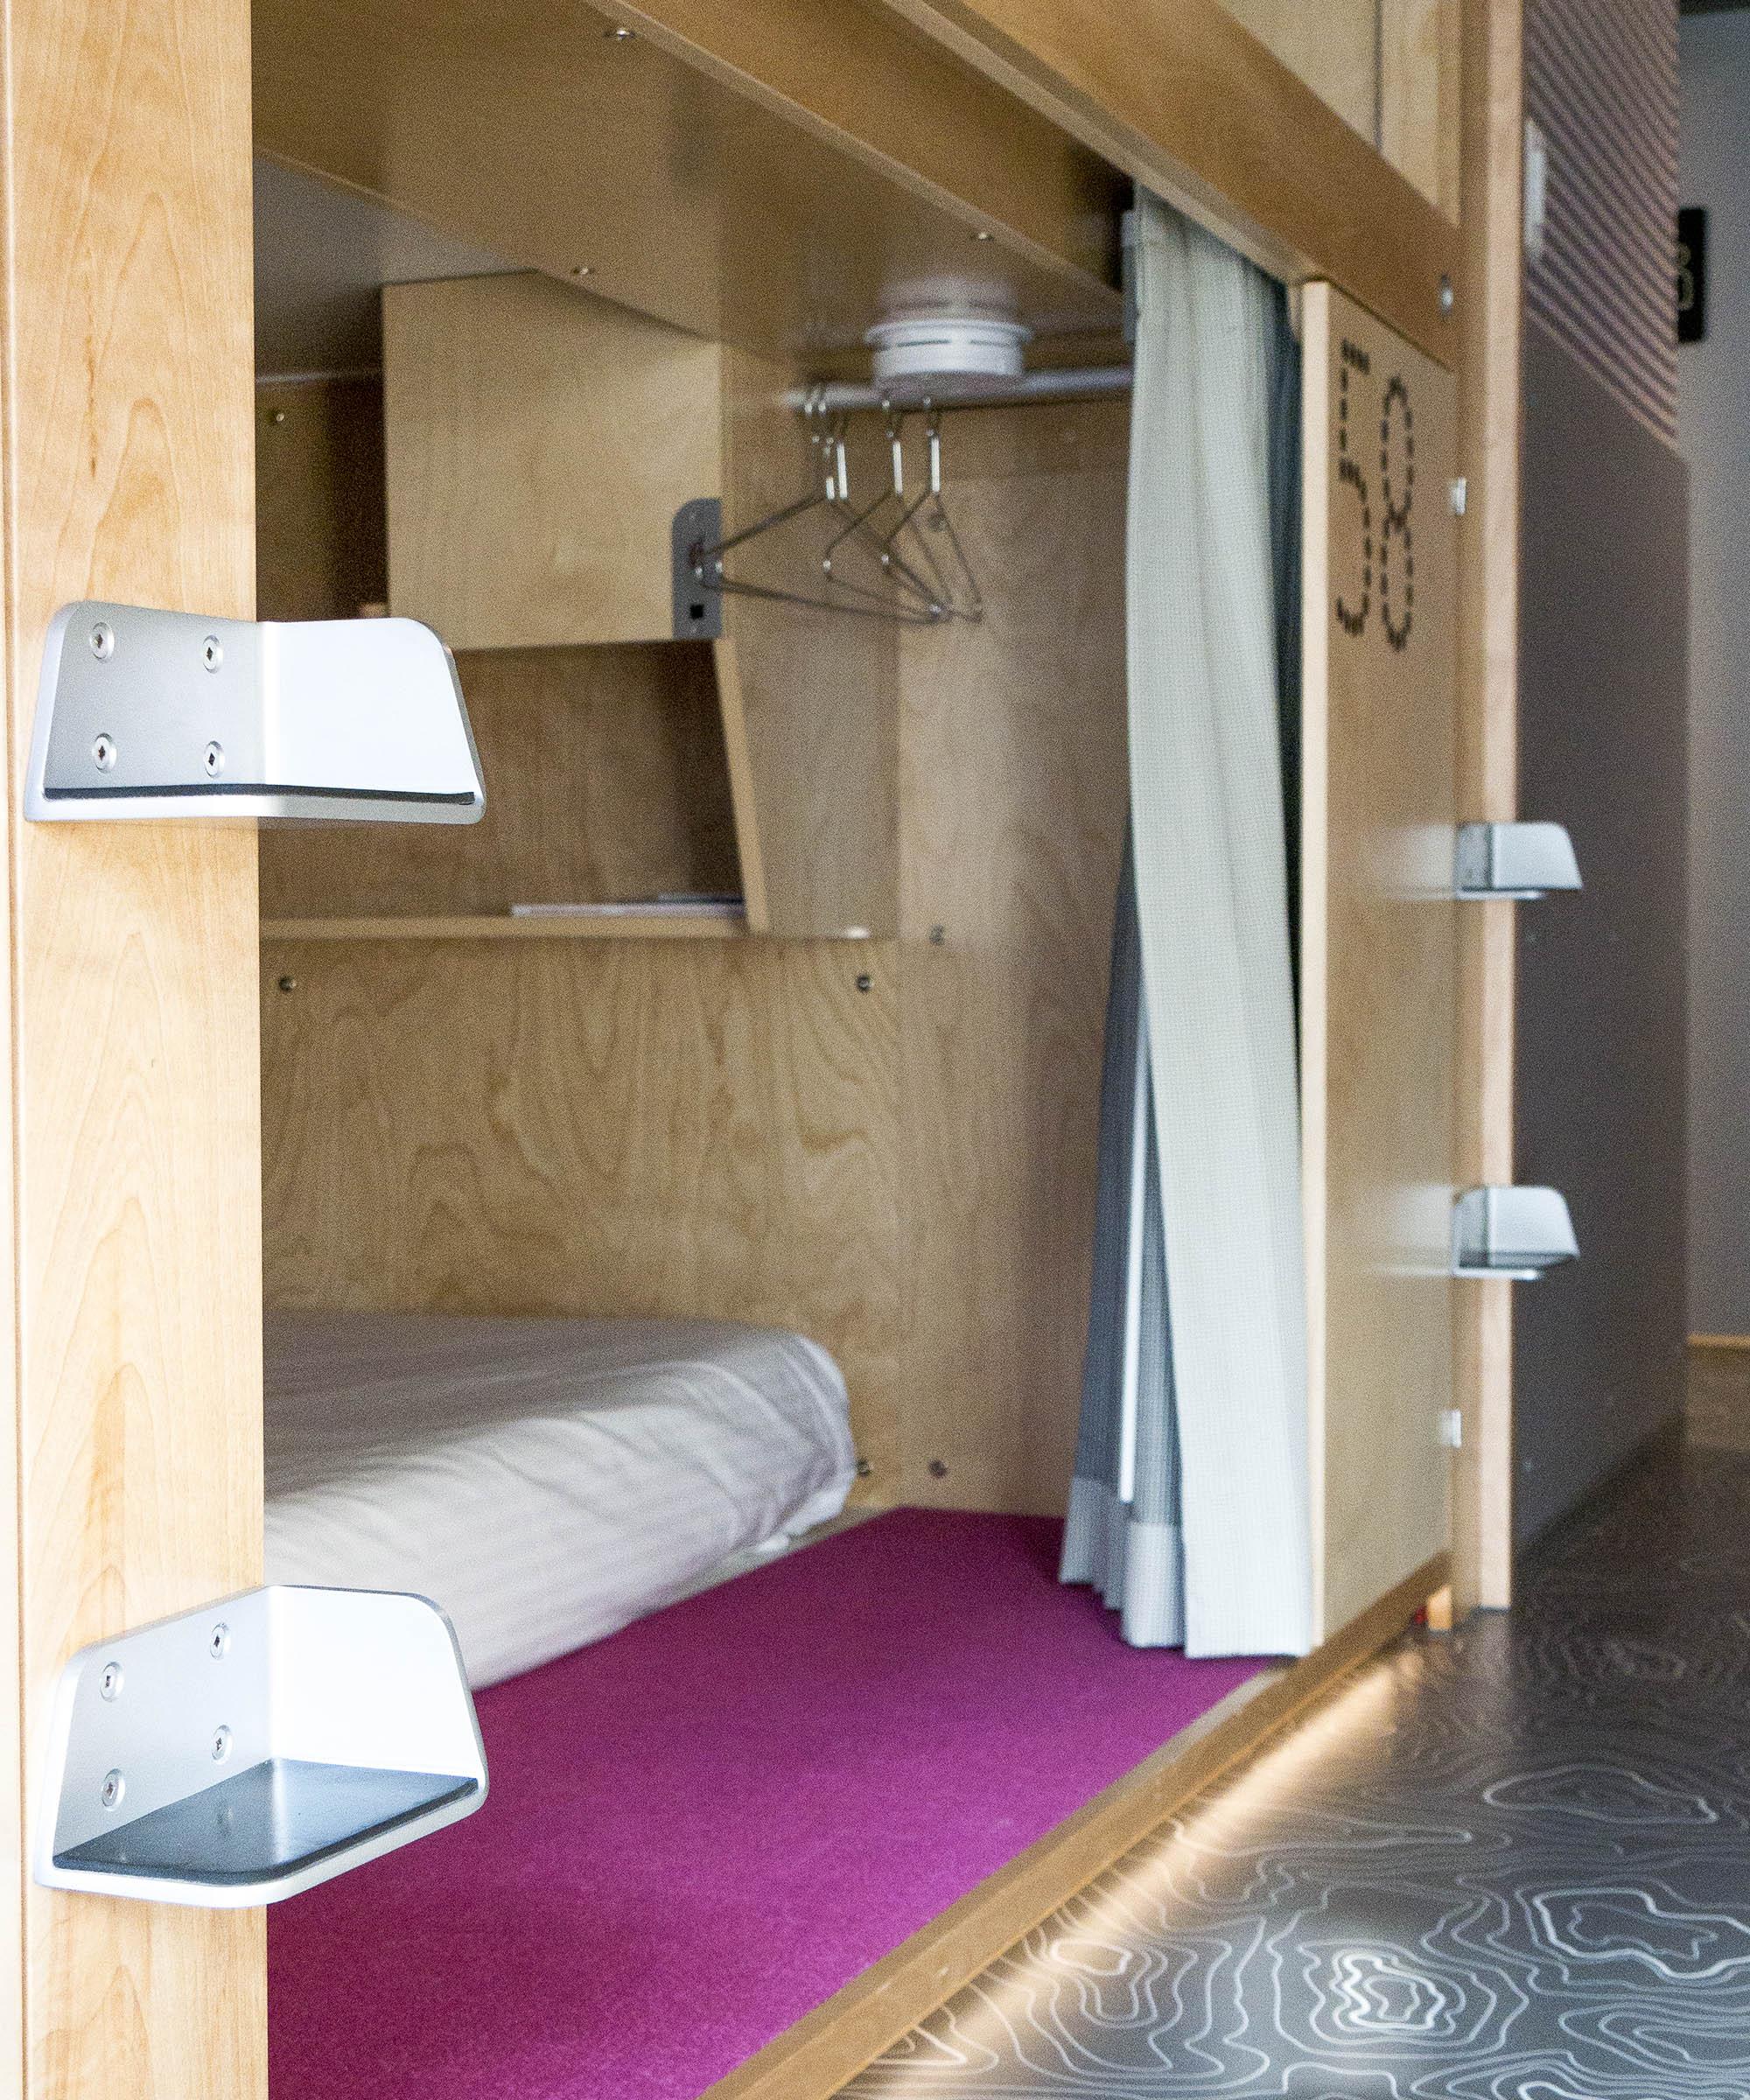 Pangea Pod Hotel - Budget Accommodation in Whistler Village